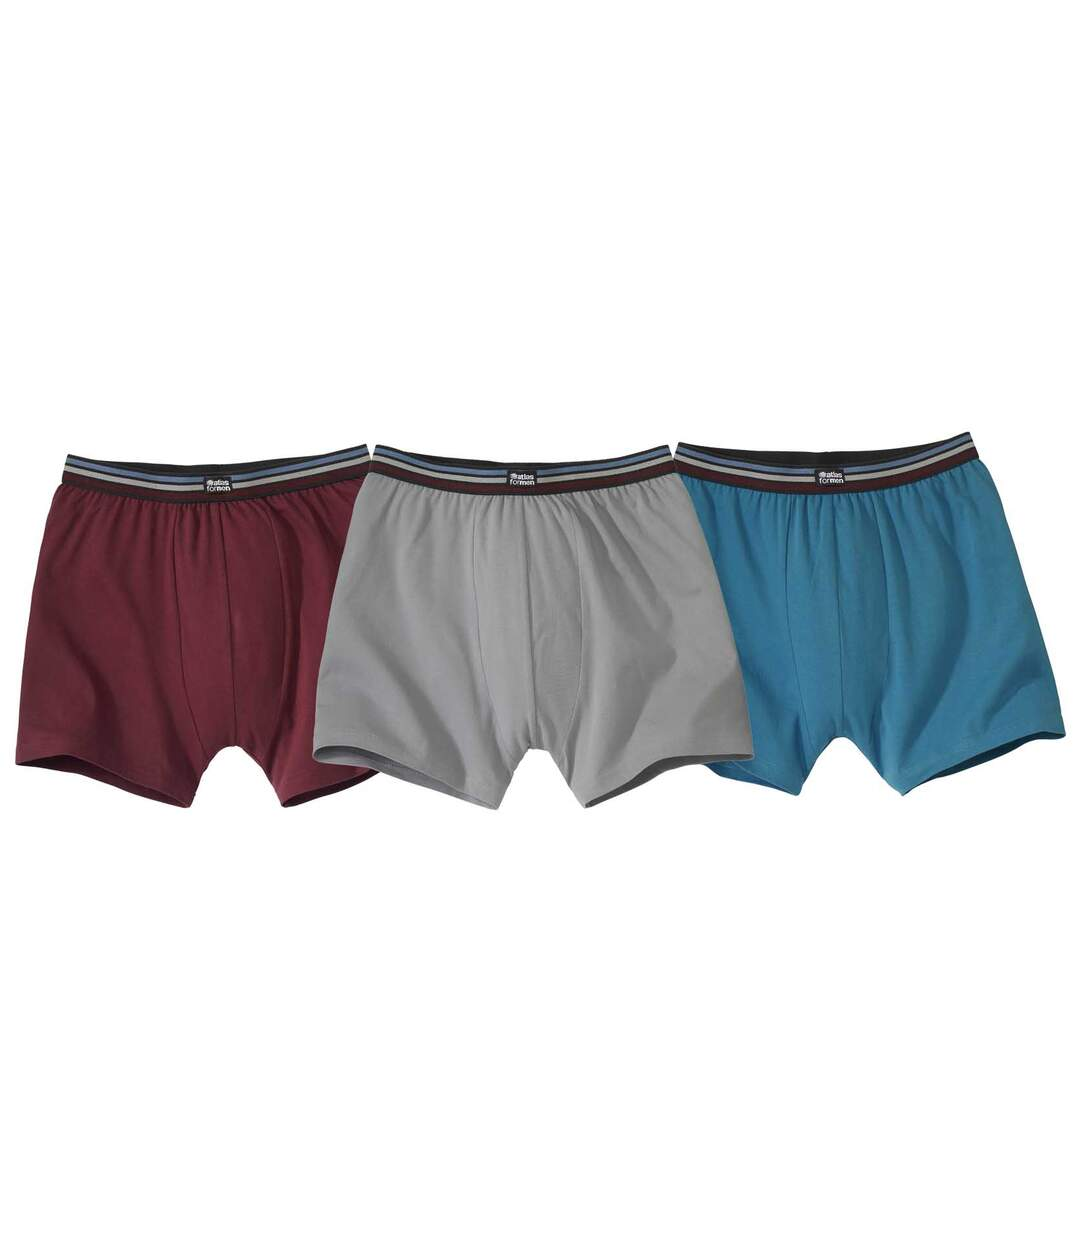 Set van 3 comfortabele boxershorts